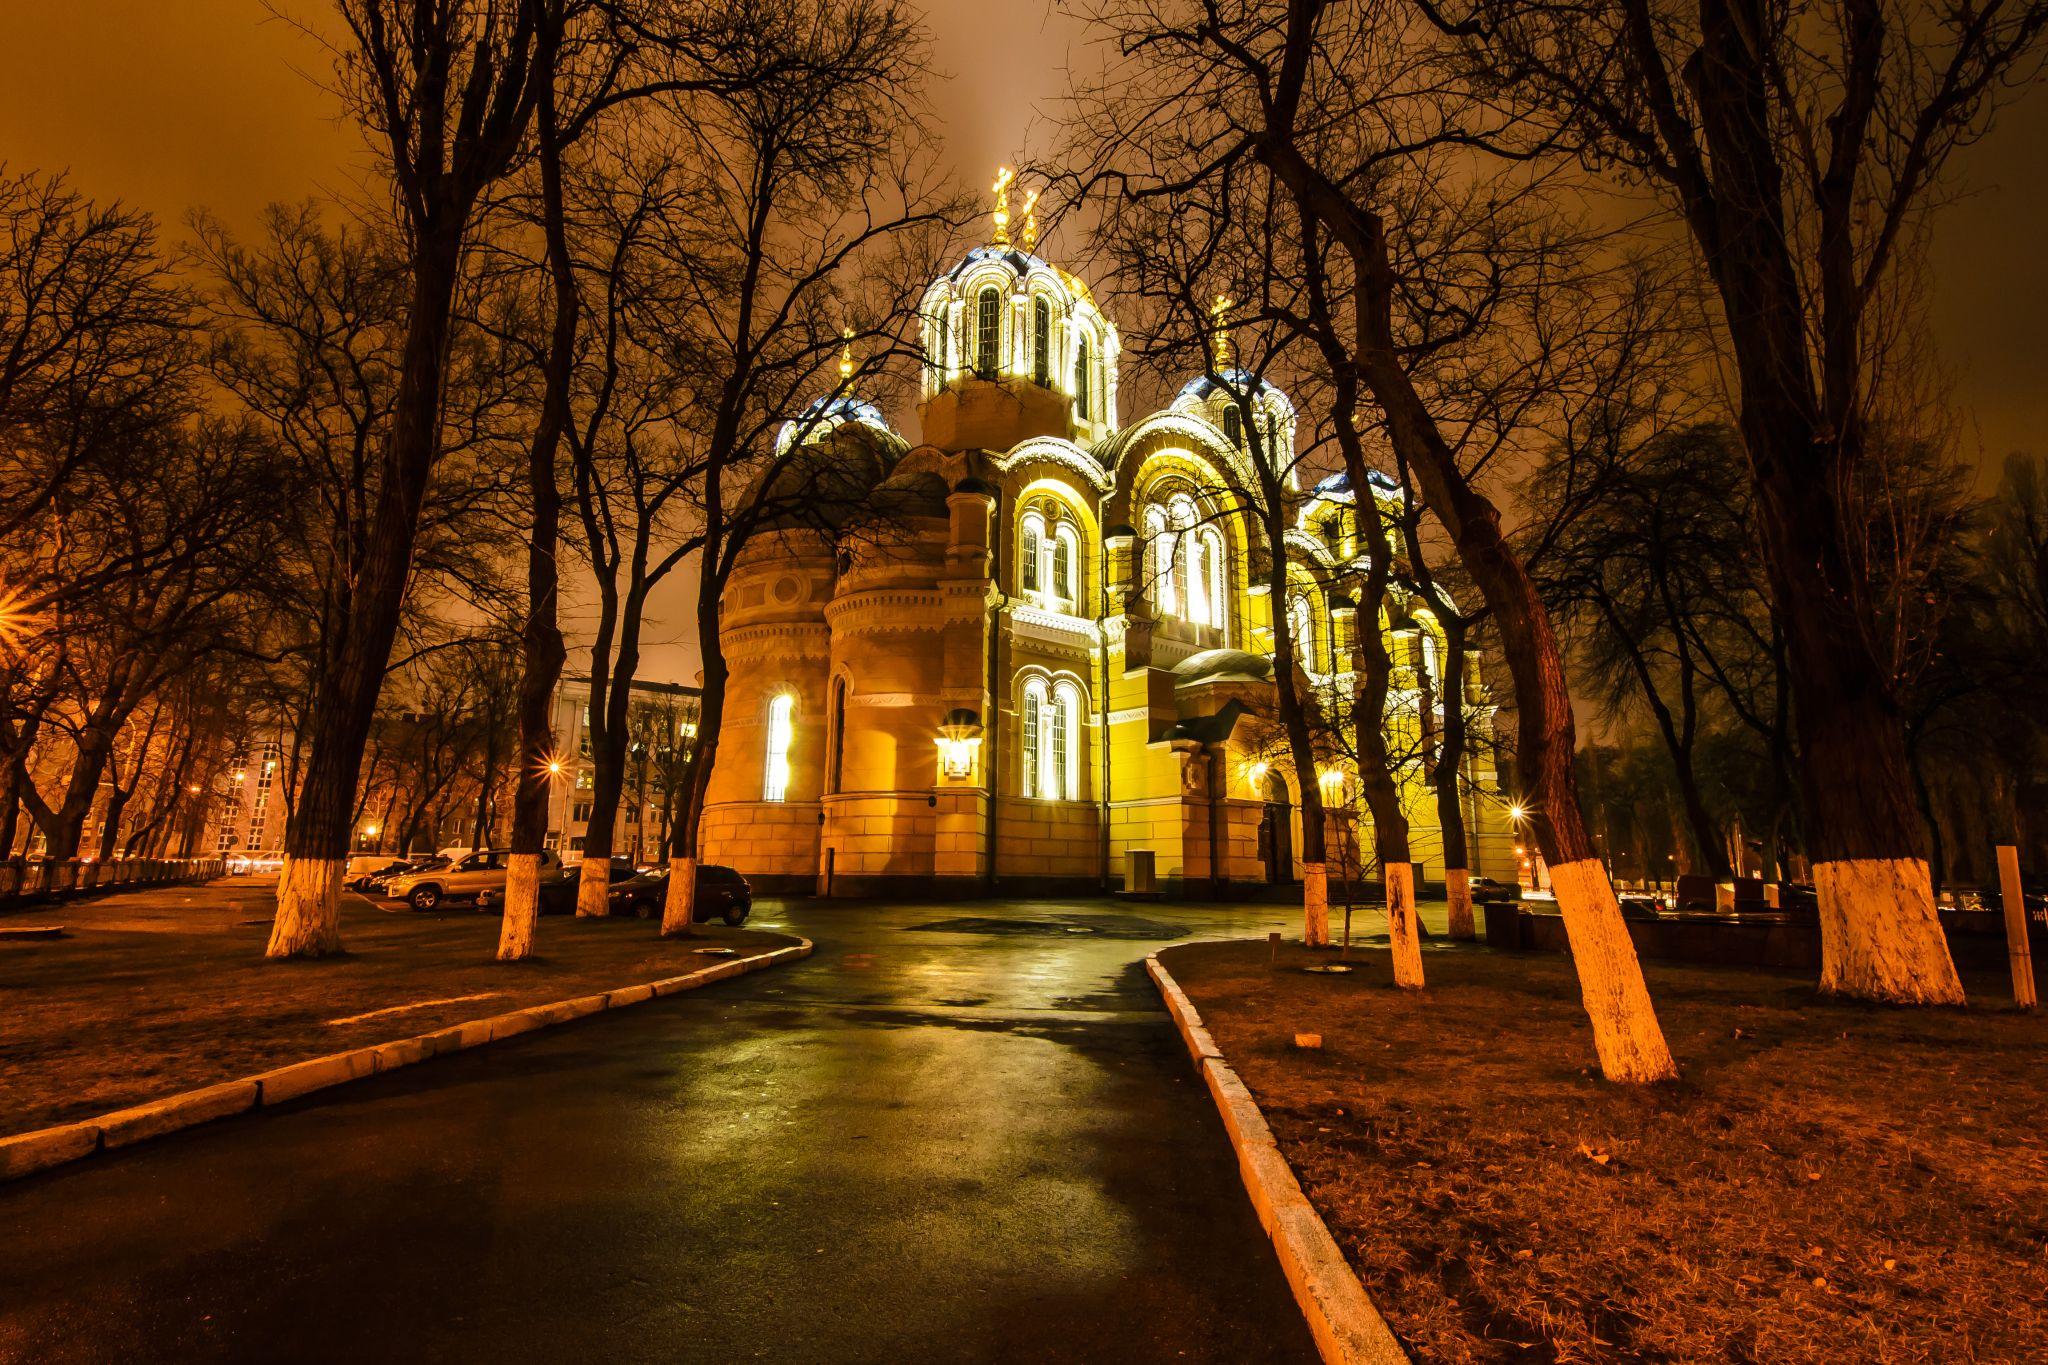 St Volodymyr's Cathedral at night, Ukraine